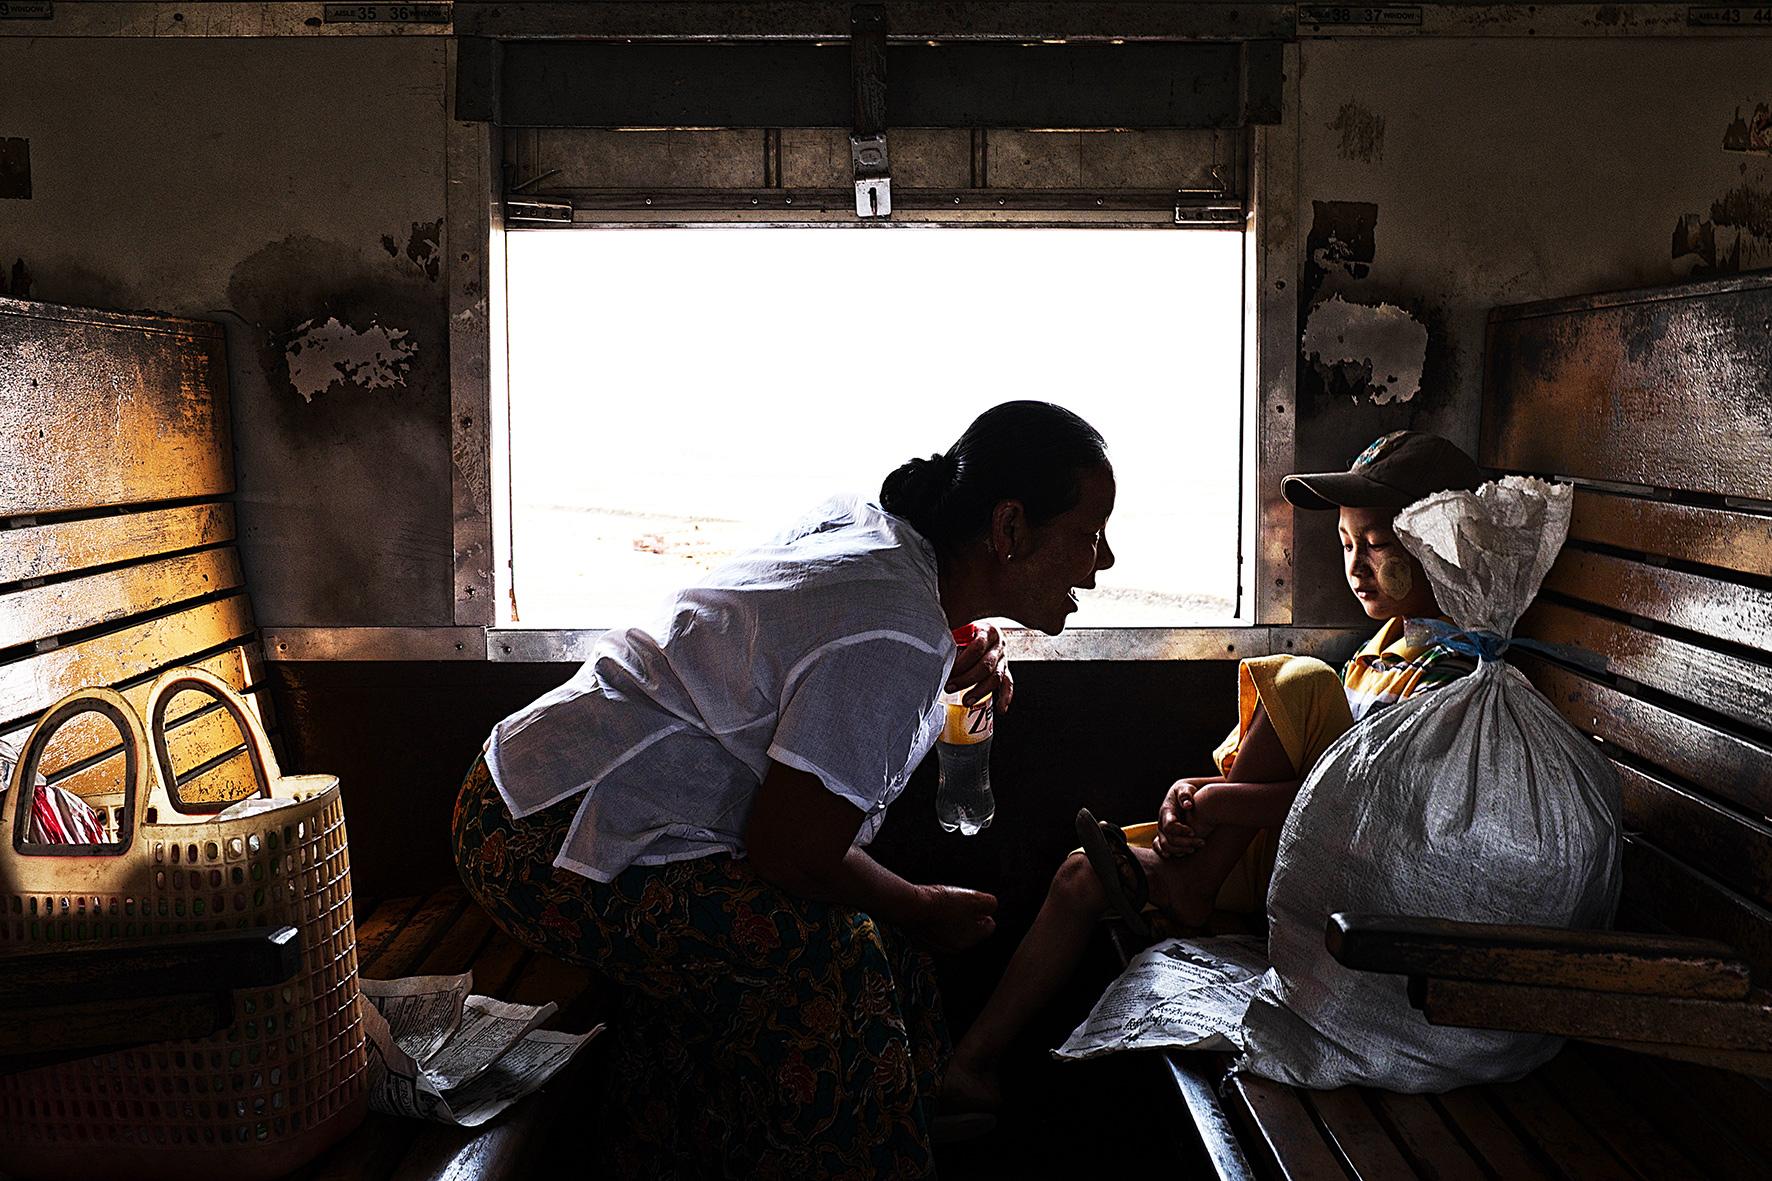 #en train 19. Myanmar. 2015